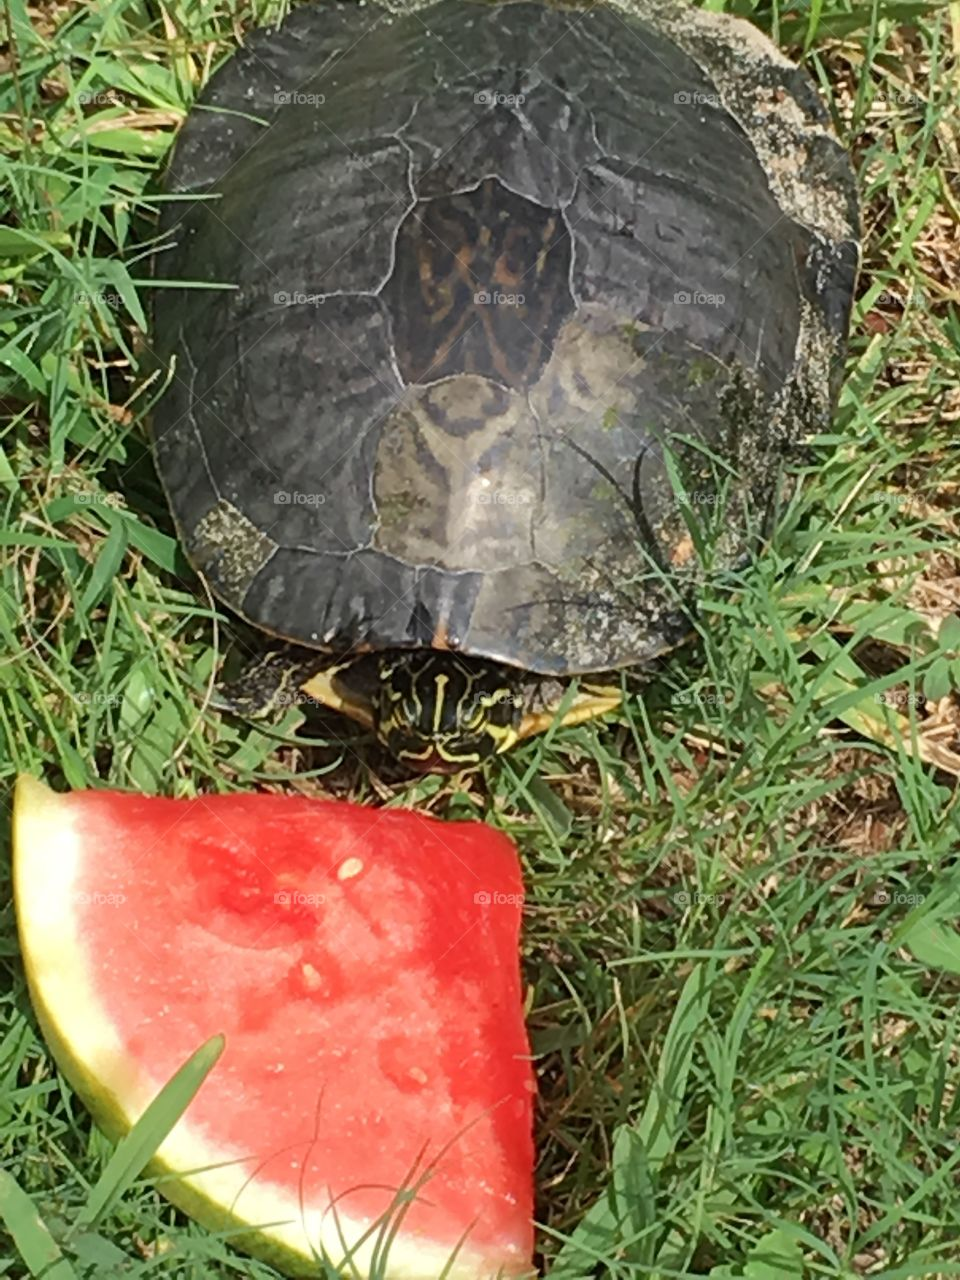 Green Florida turtle eating watermelon 🍉